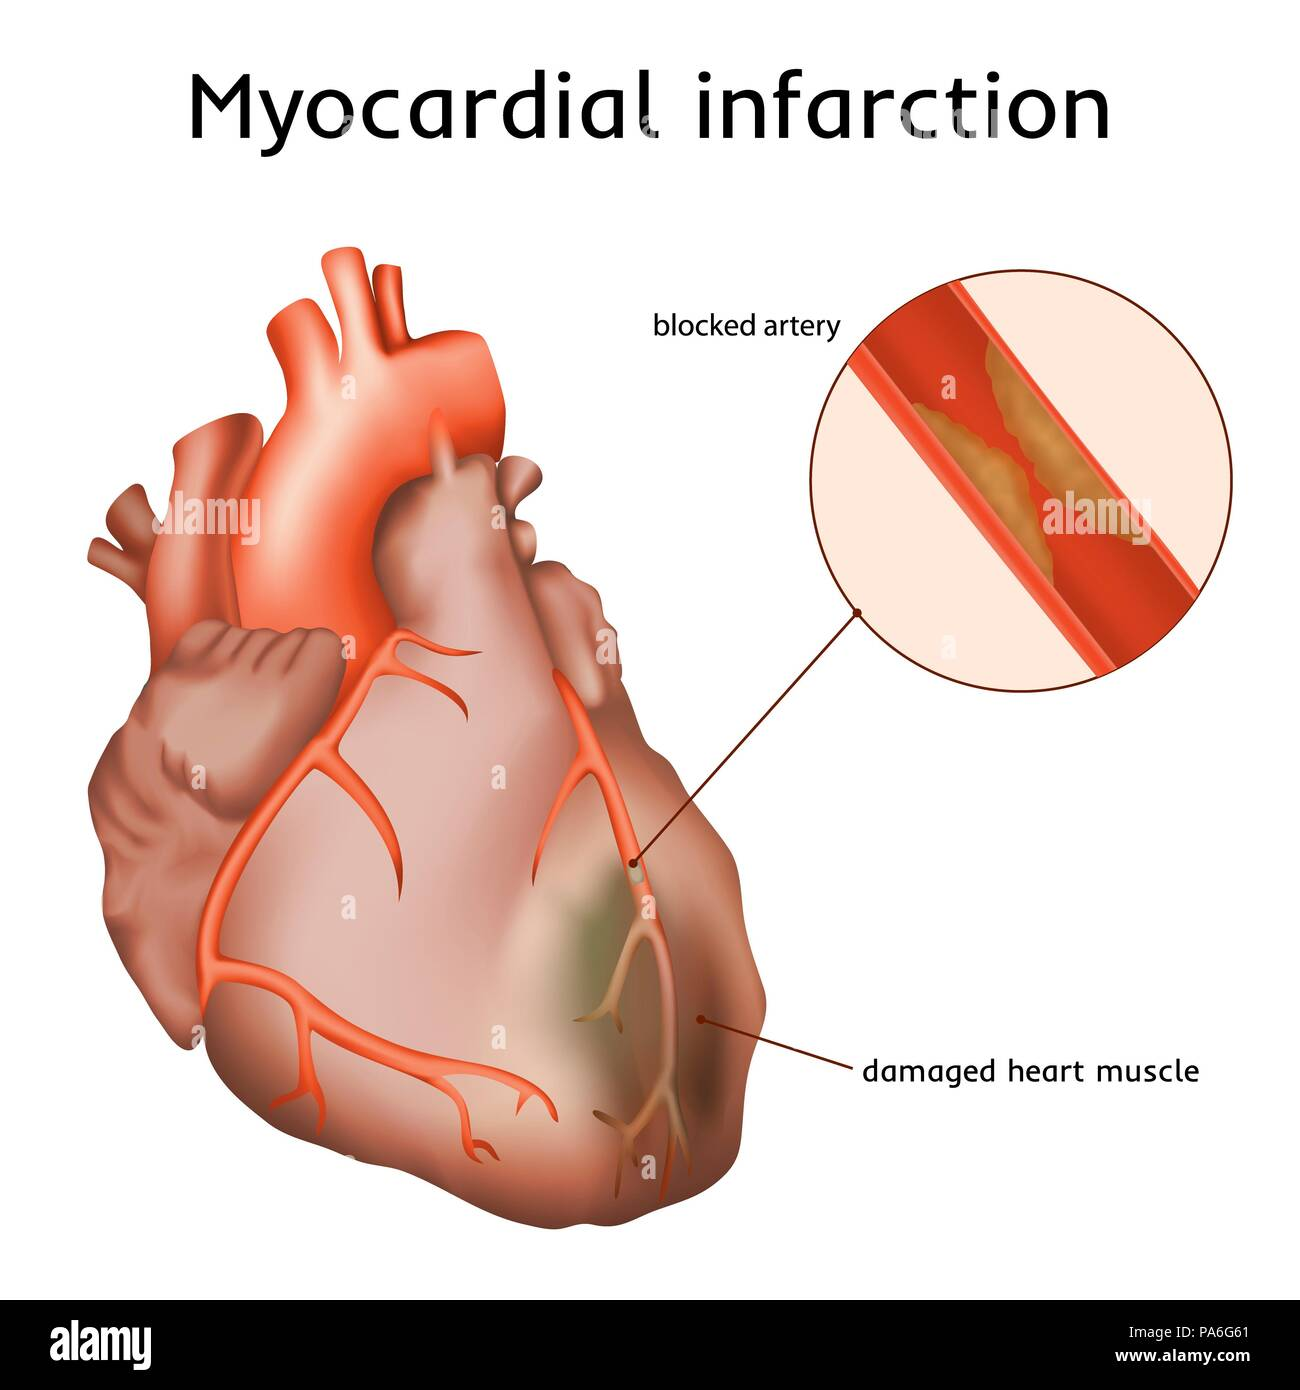 Heart attack (myocardial infarction), illustration. A blocked coronary artery has led to heart muscle damage. - Stock Image